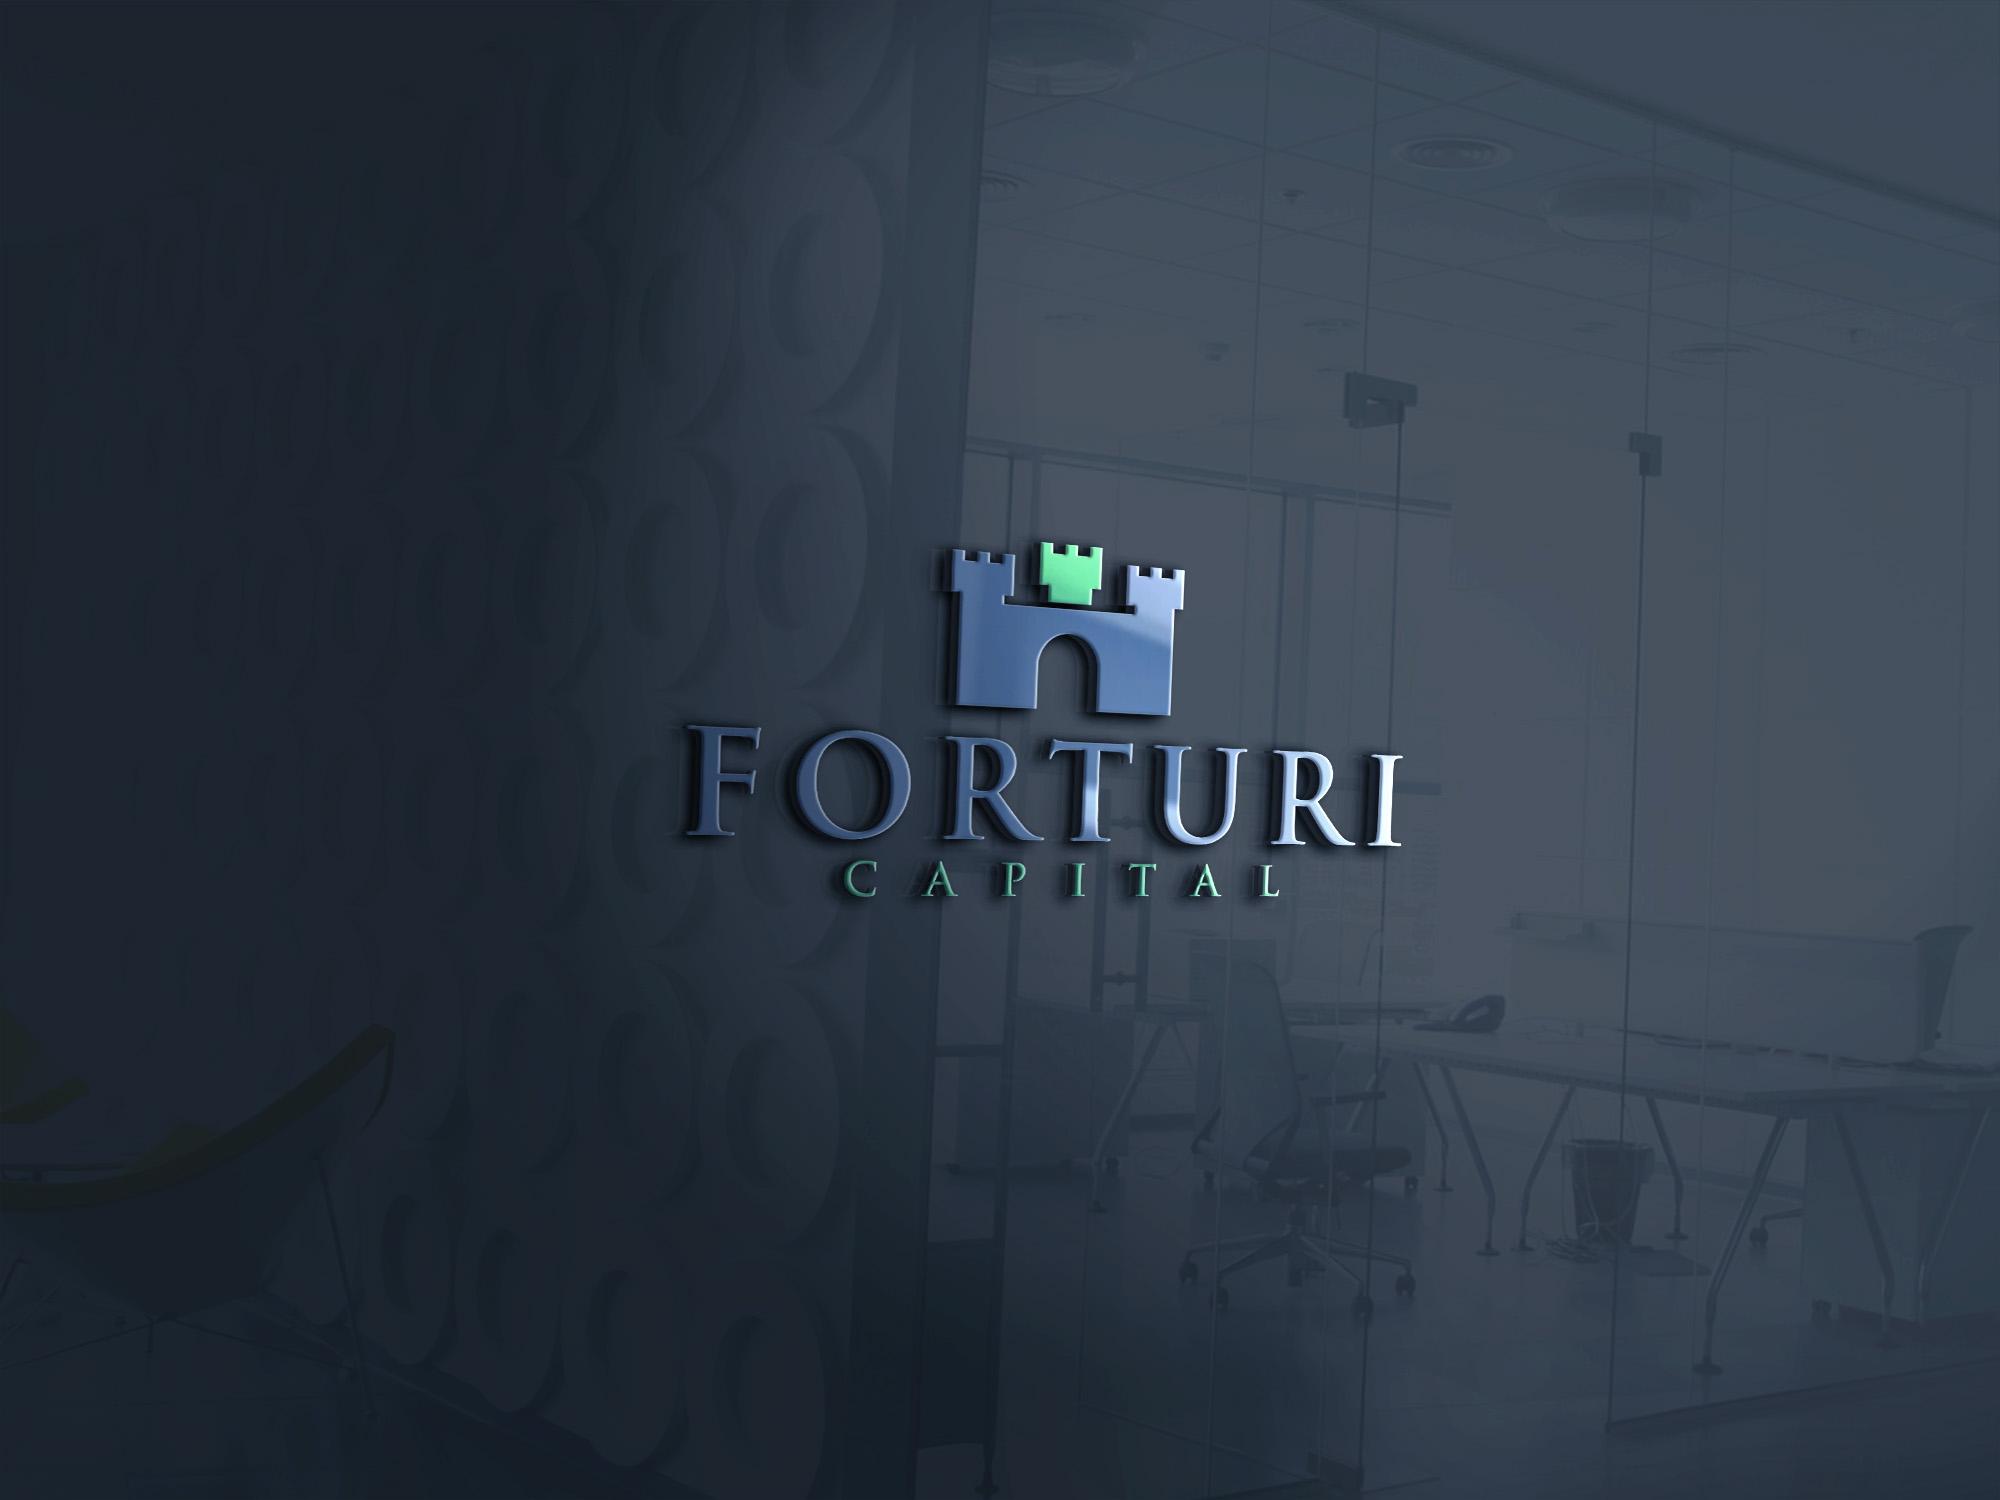 FORTURI